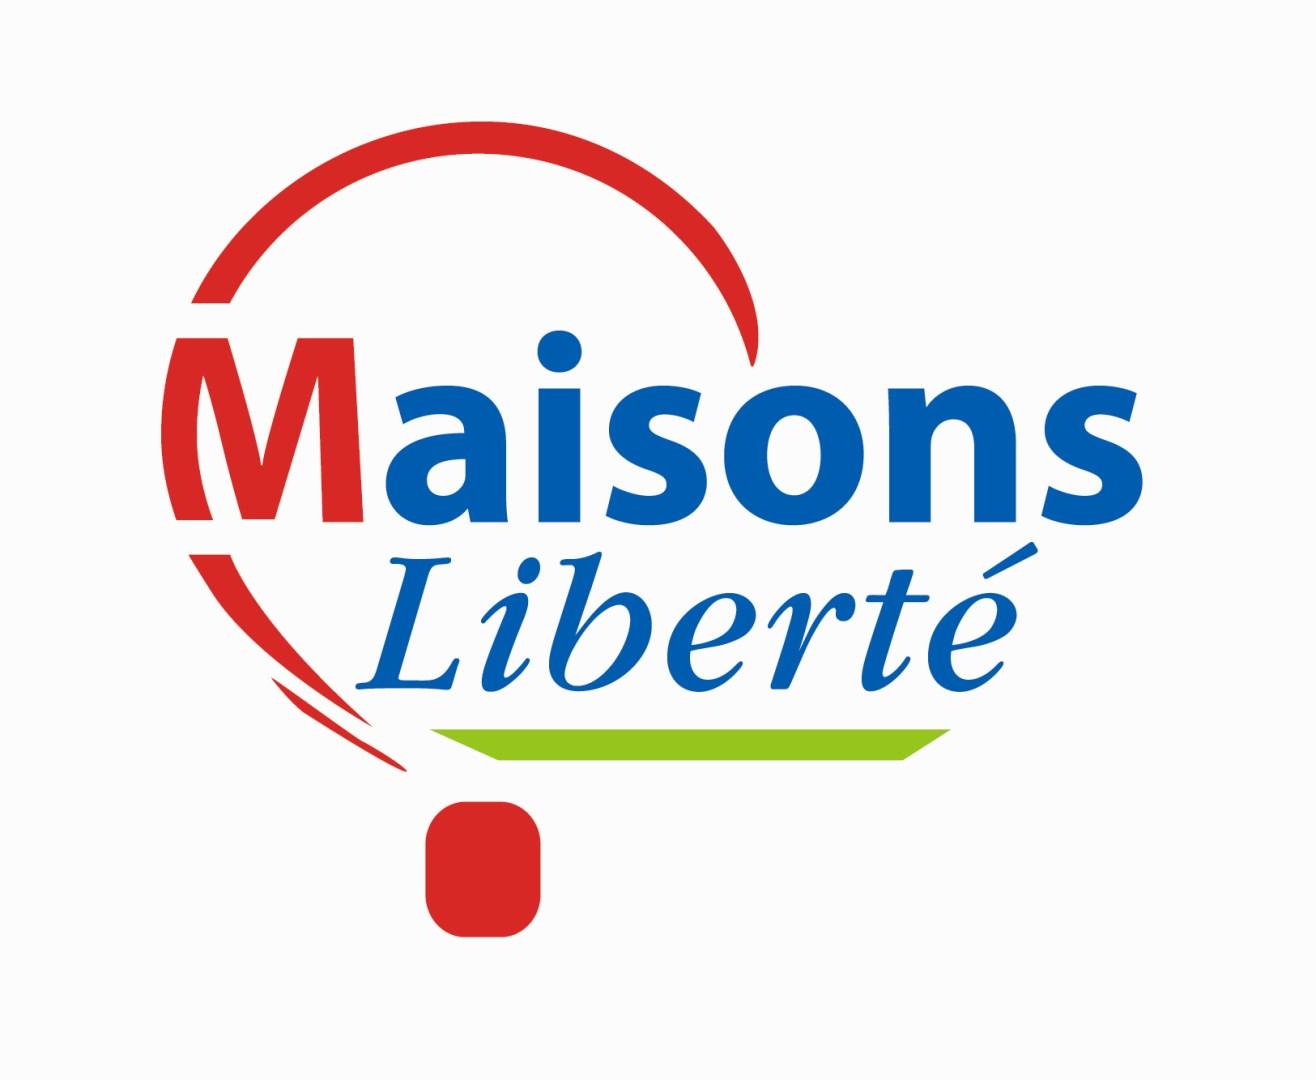 MAISONS LIBERTE